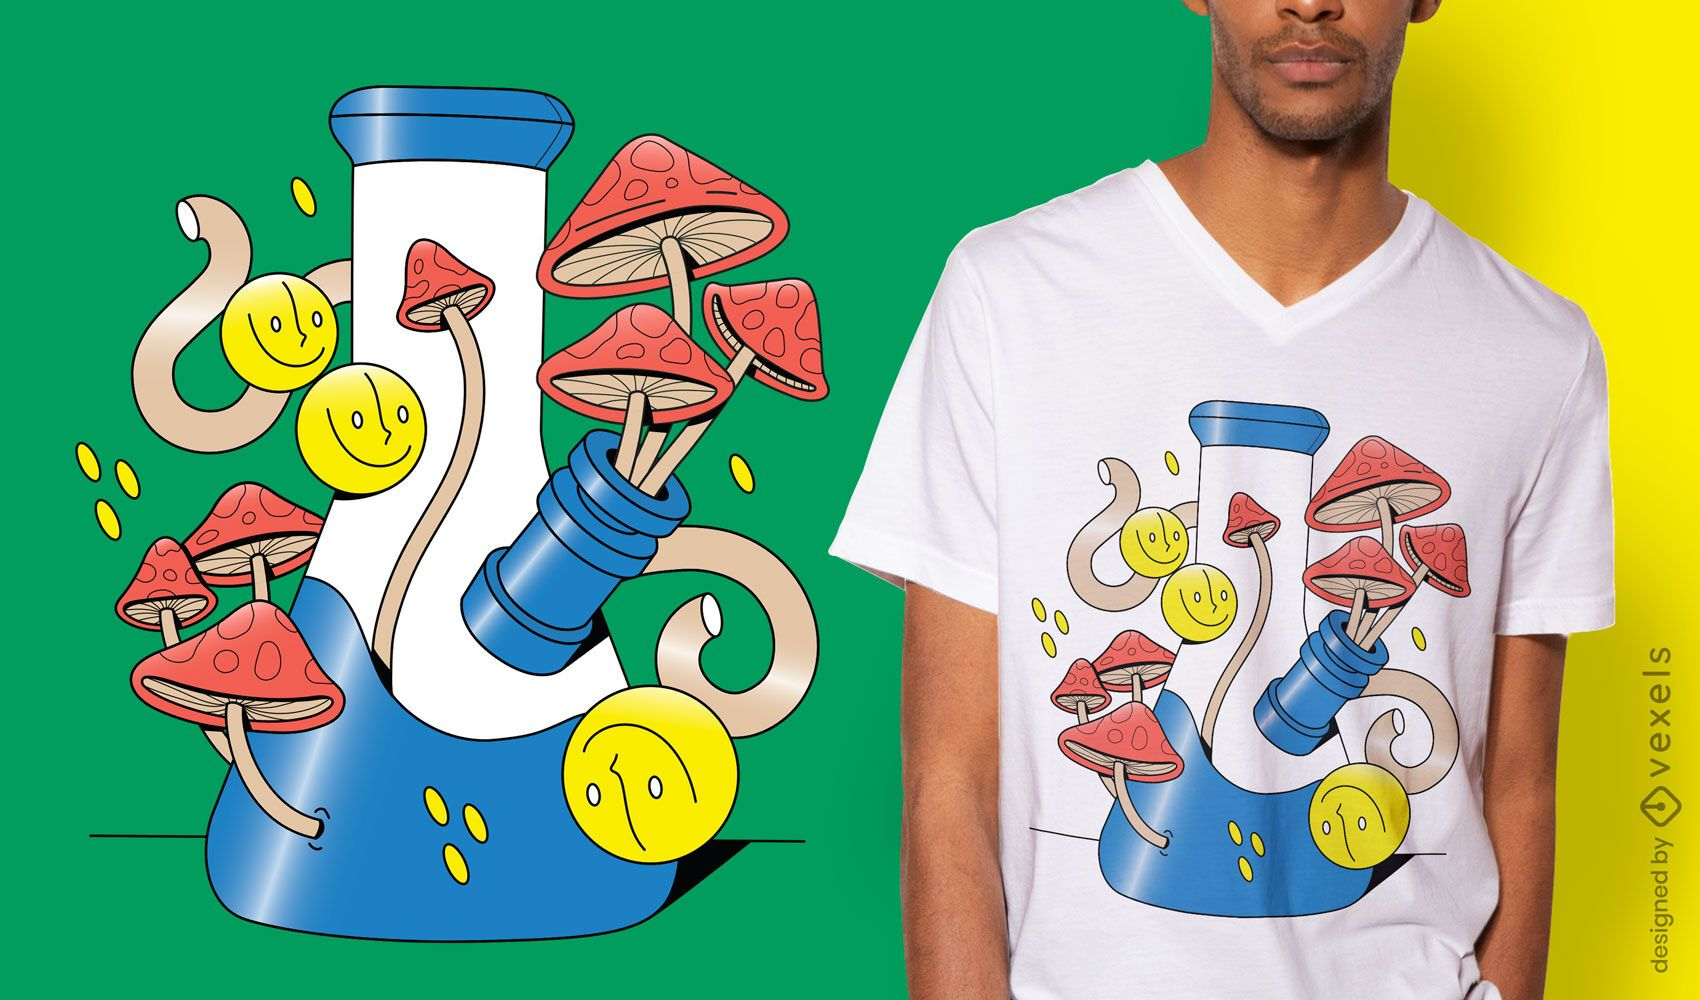 Surreal hookah t-shirt design